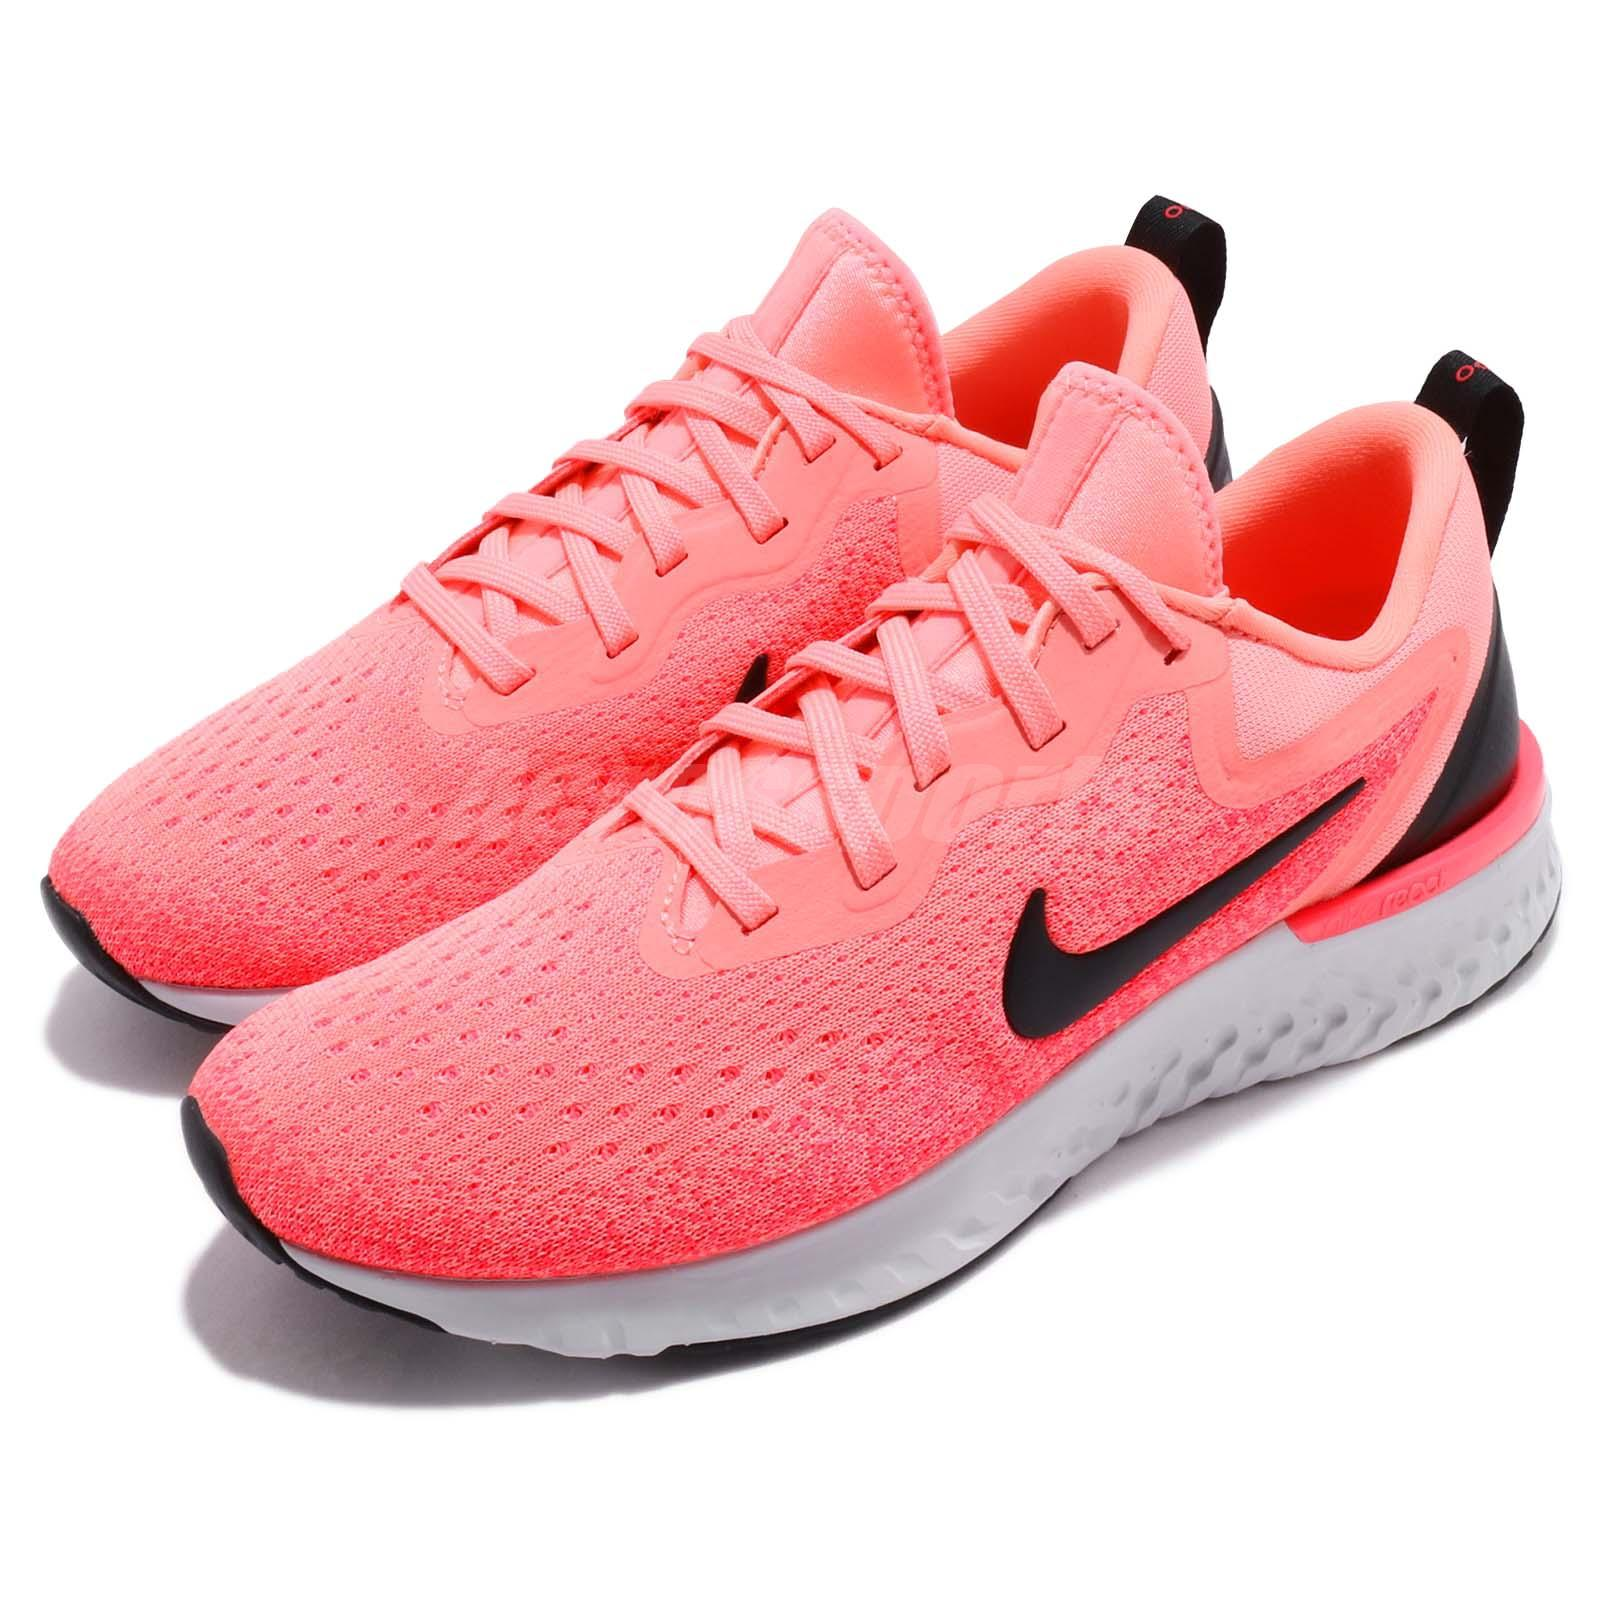 6e247a74b06f Details about Nike Wmns Odyssey React Light Atomic Pink Black Women Running  Shoes AO9820-602